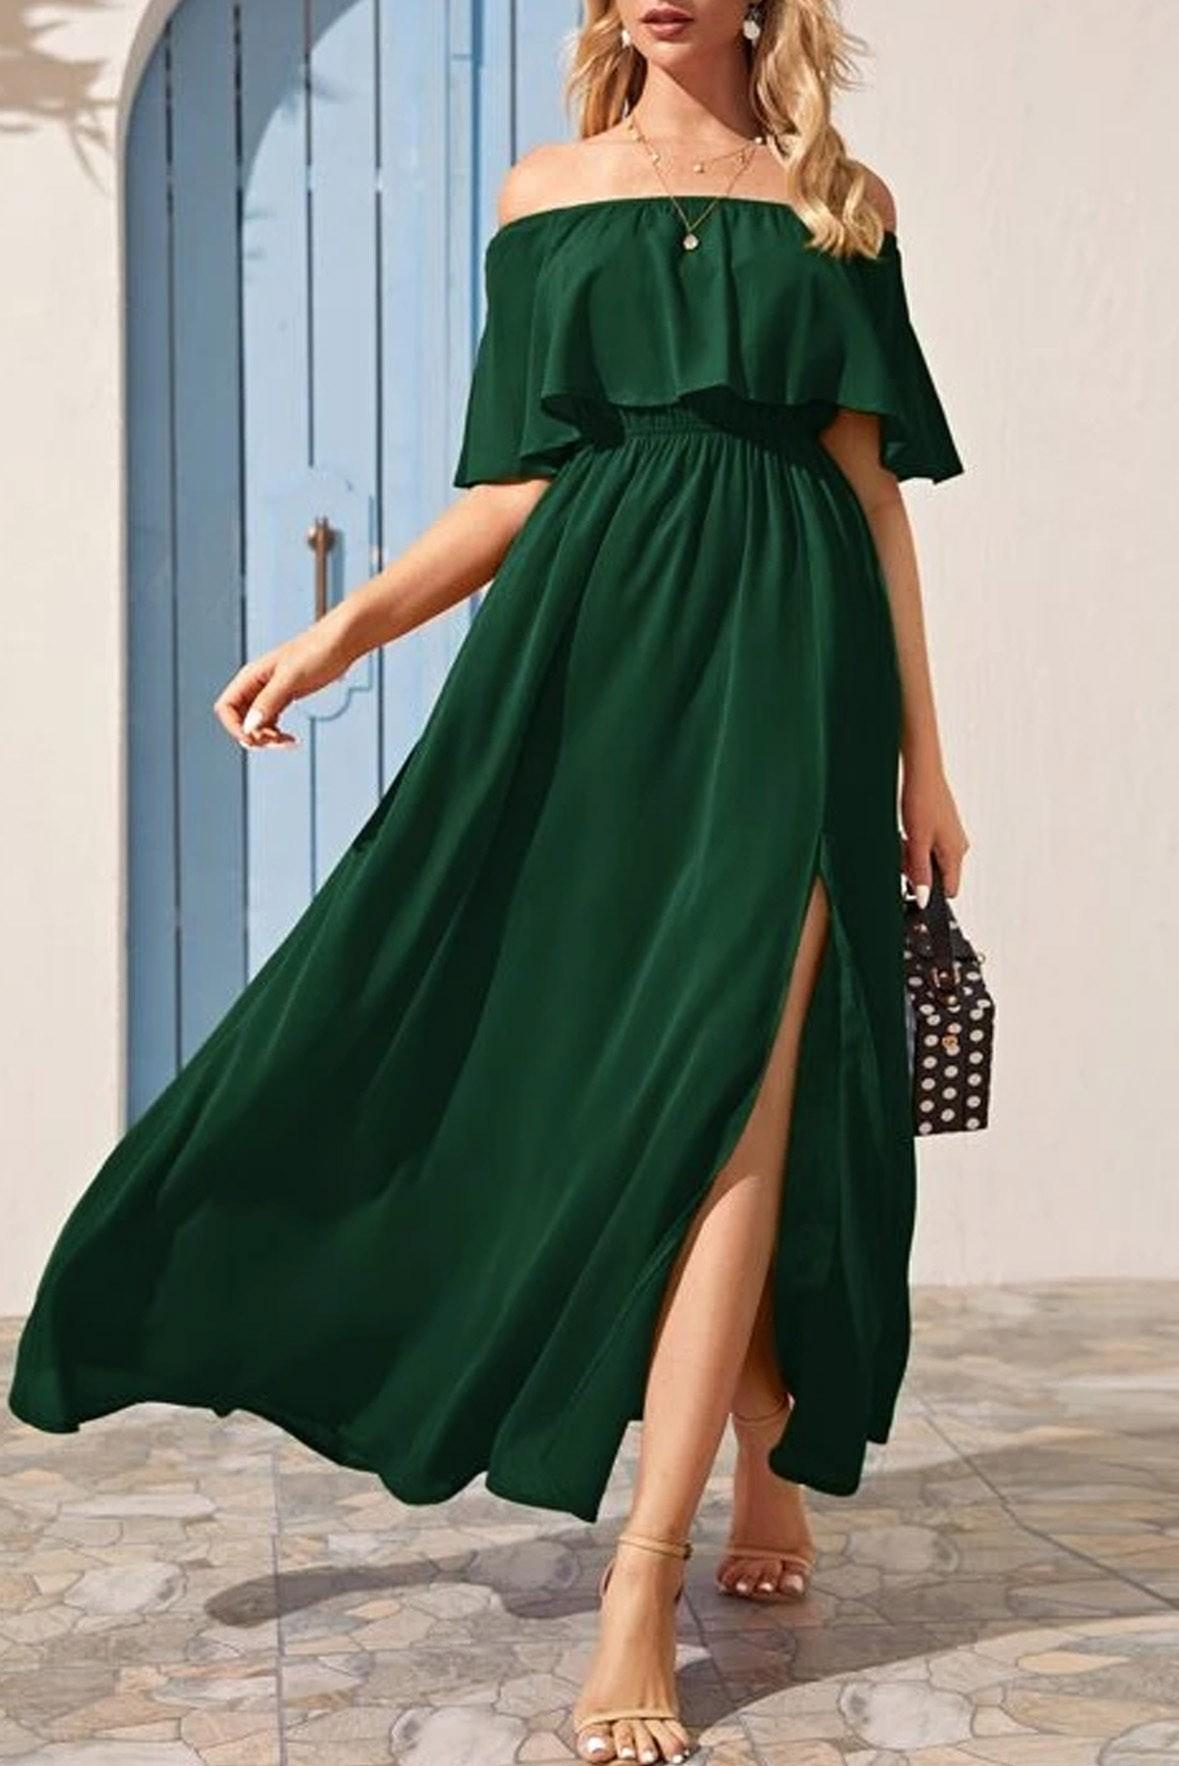 Go with the flow slit dress